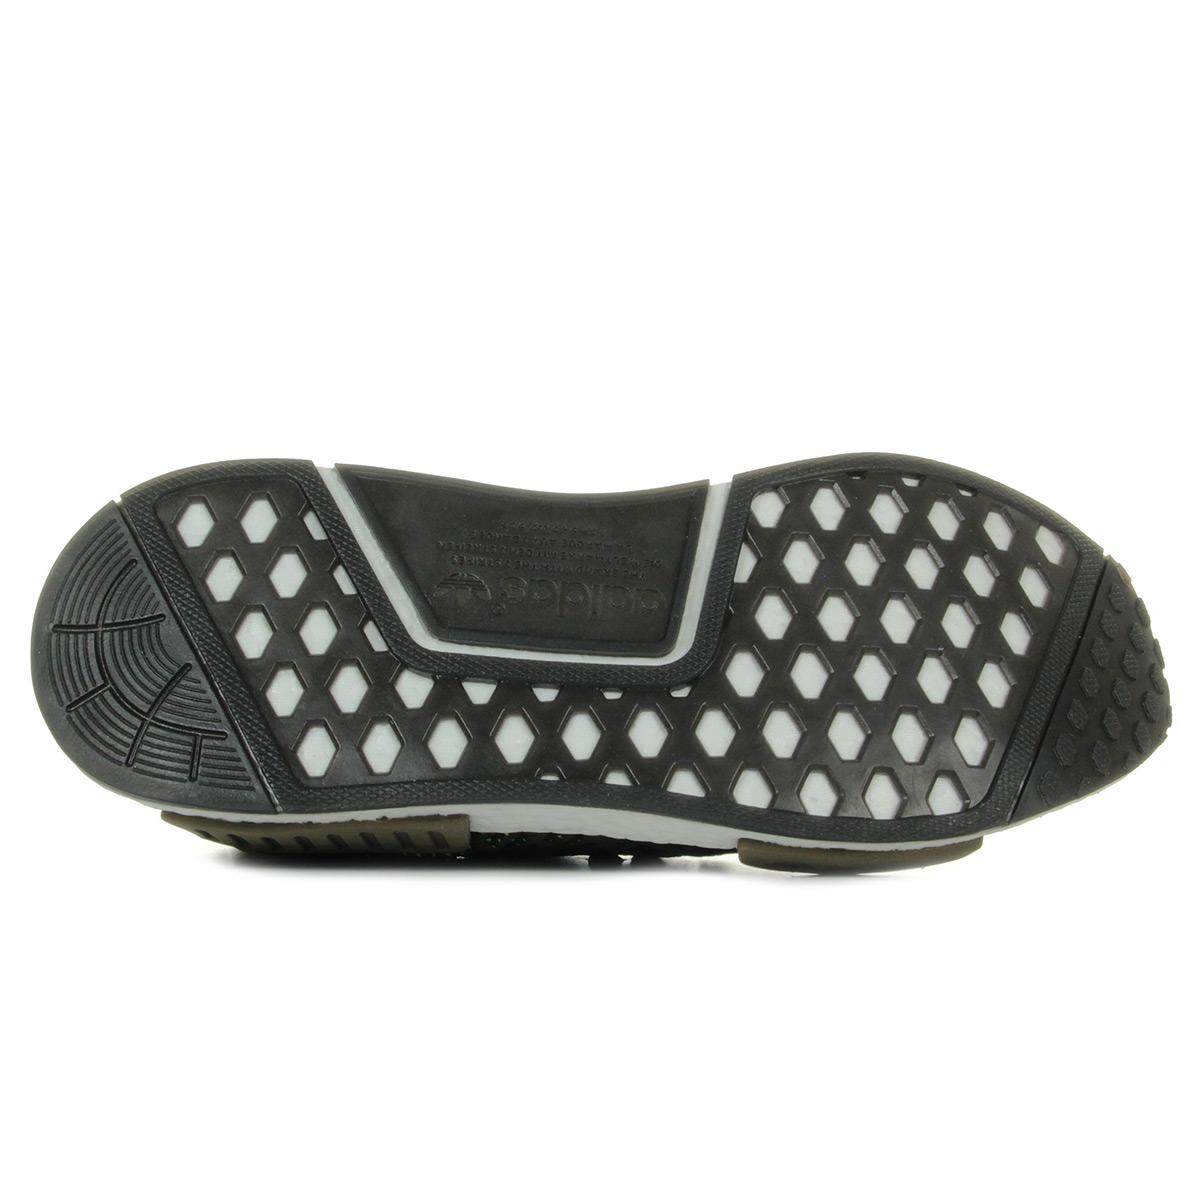 adidas Nmd R1 Stlt Pk CQ2389, Baskets mode homme